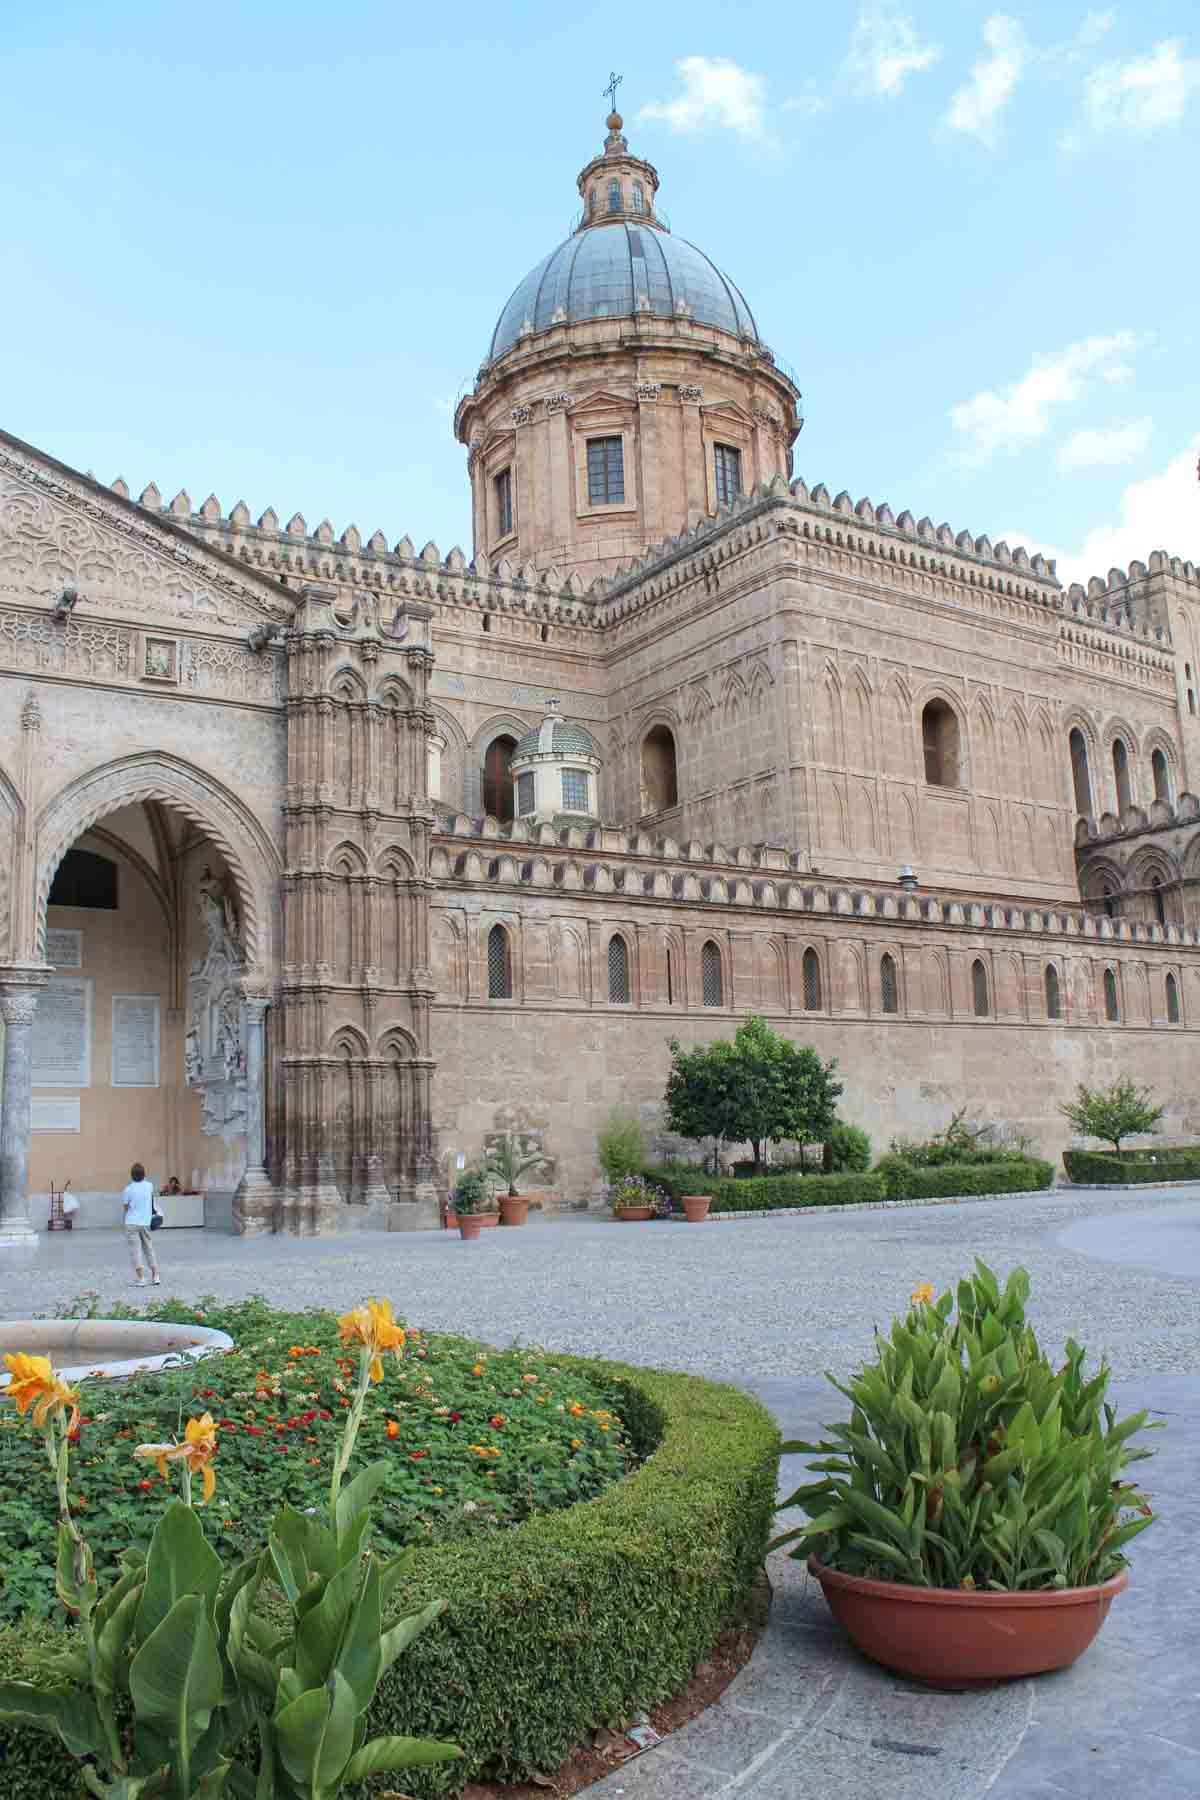 De mooiste plekken van Noord-Sicilië [roadtrip route], Palermo - Map of Joy